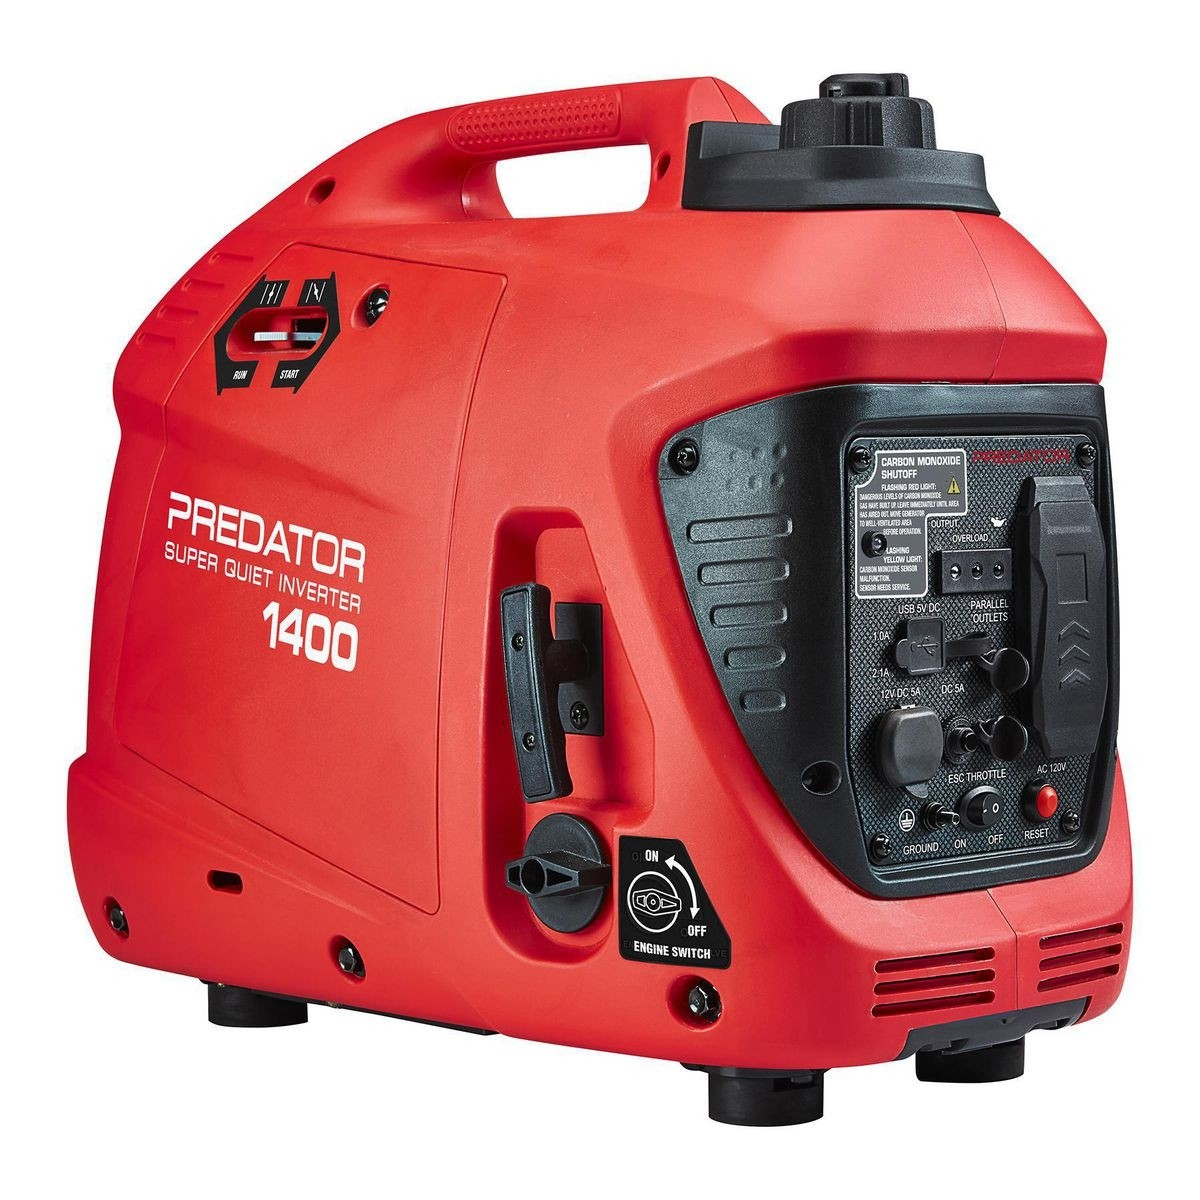 PREDATOR 1400 Watt Super Quiet Inverter Generator With CO SECURE™ - Item 57063